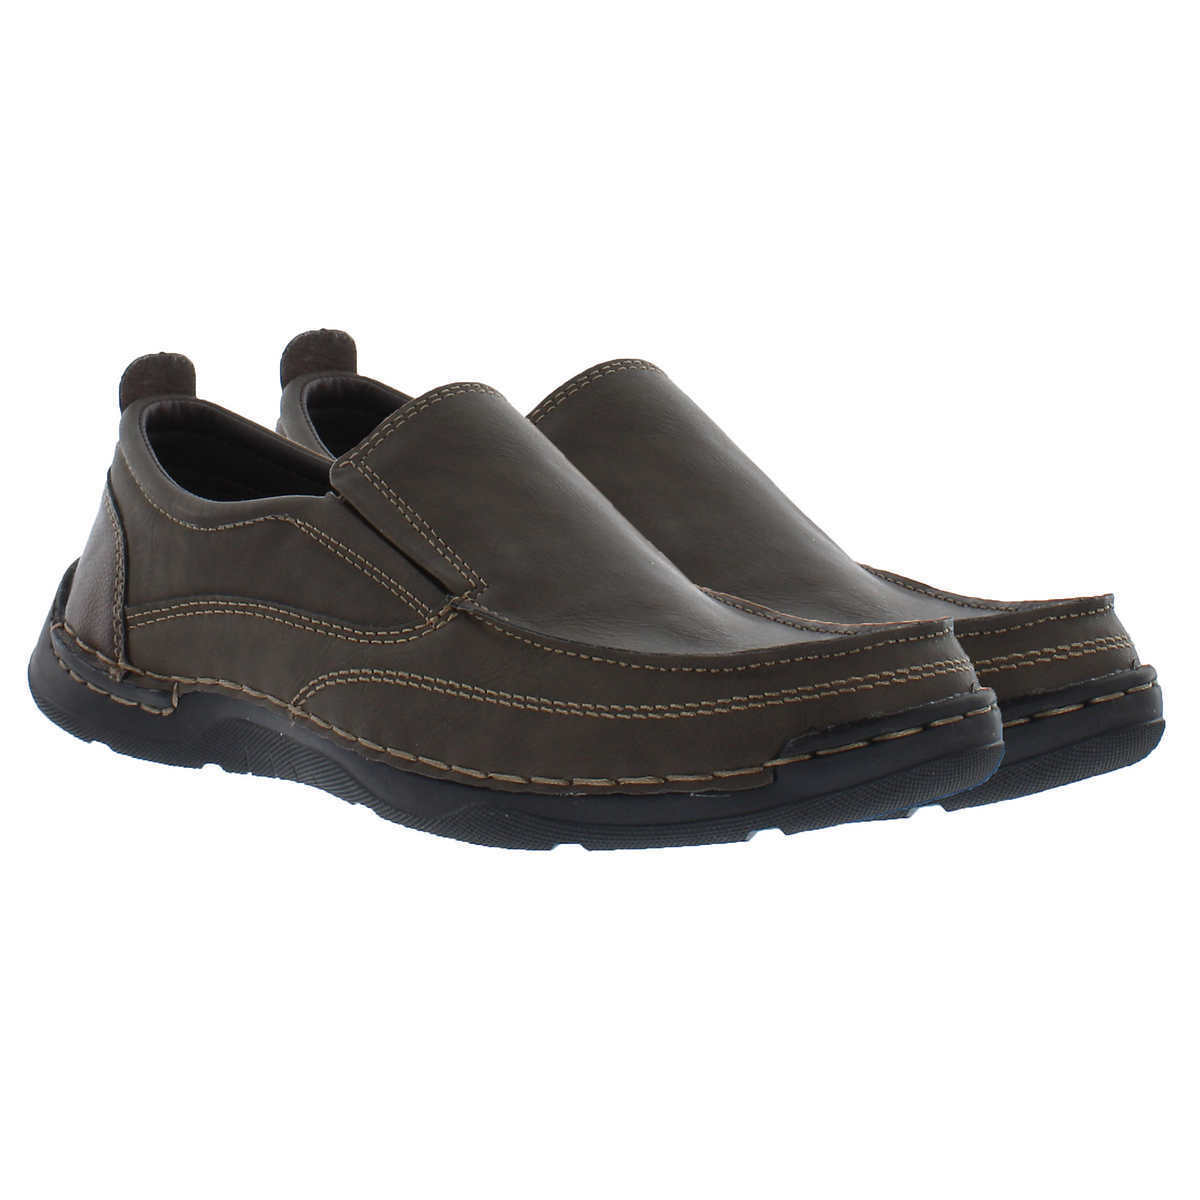 Izod Thomas Men's Slip On Shoe Memory Foam Flexible LightWeight Loafer